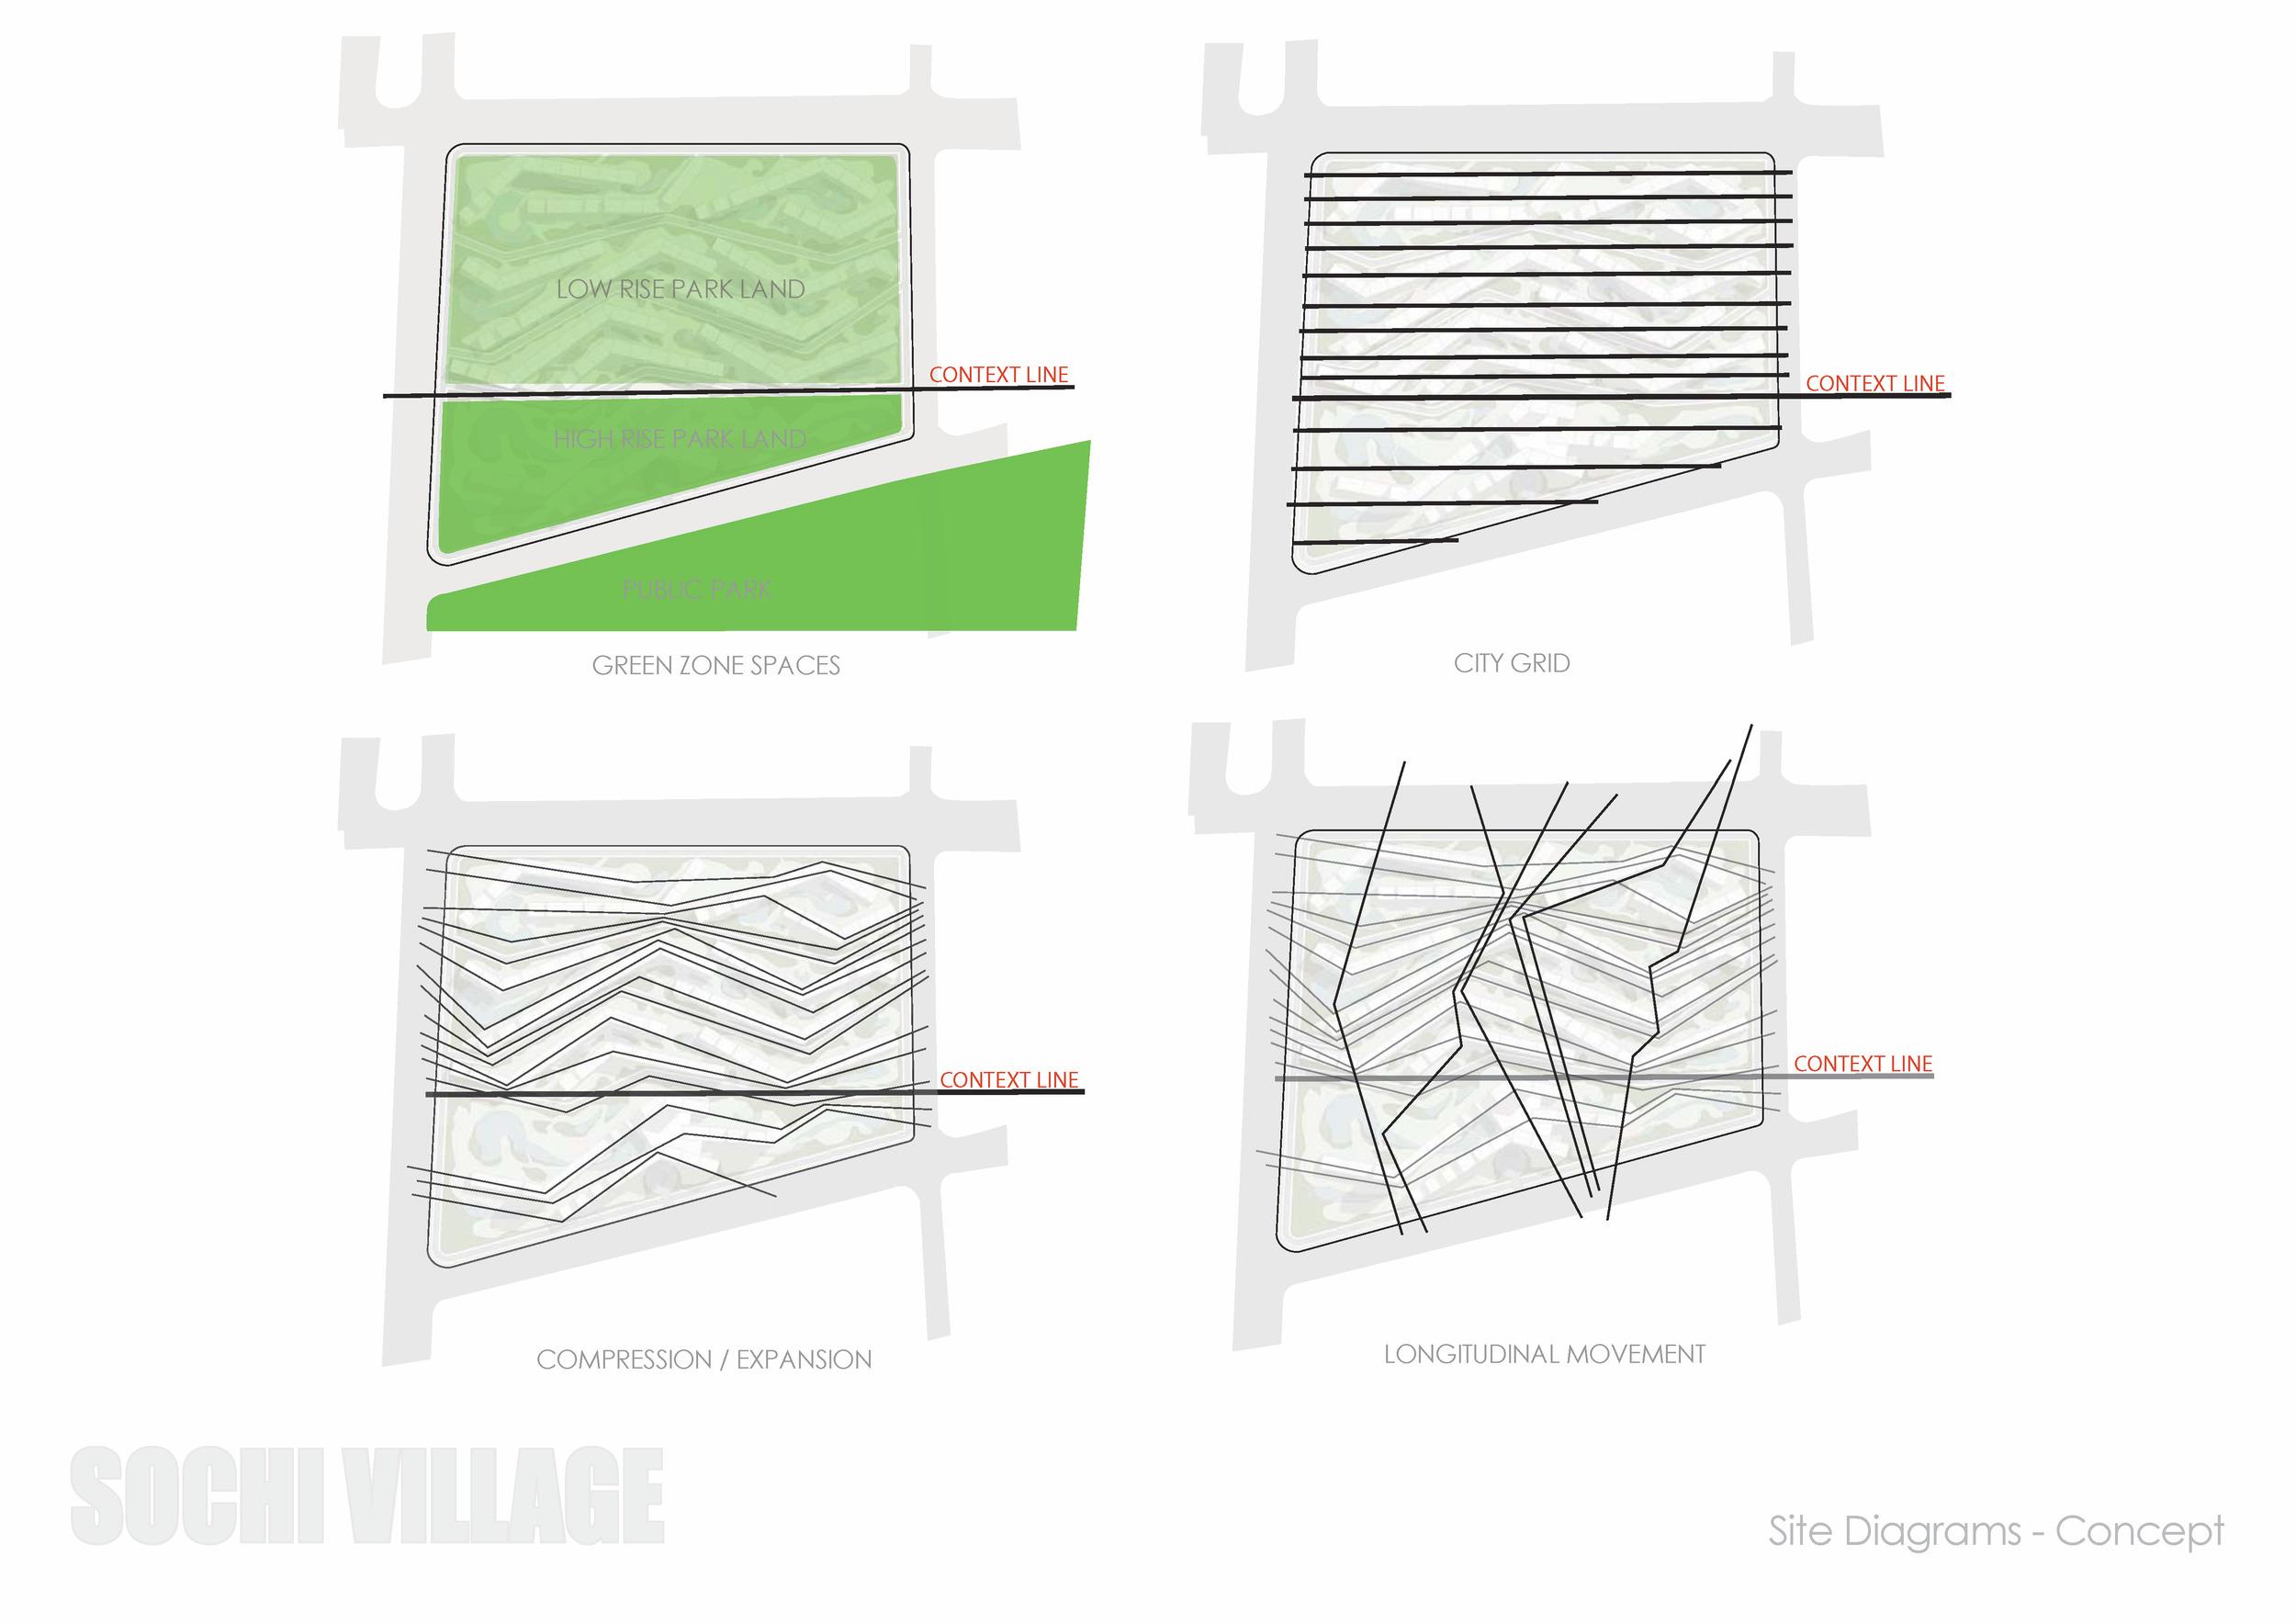 Sochi Olympic Village Site Diagrams - Concept